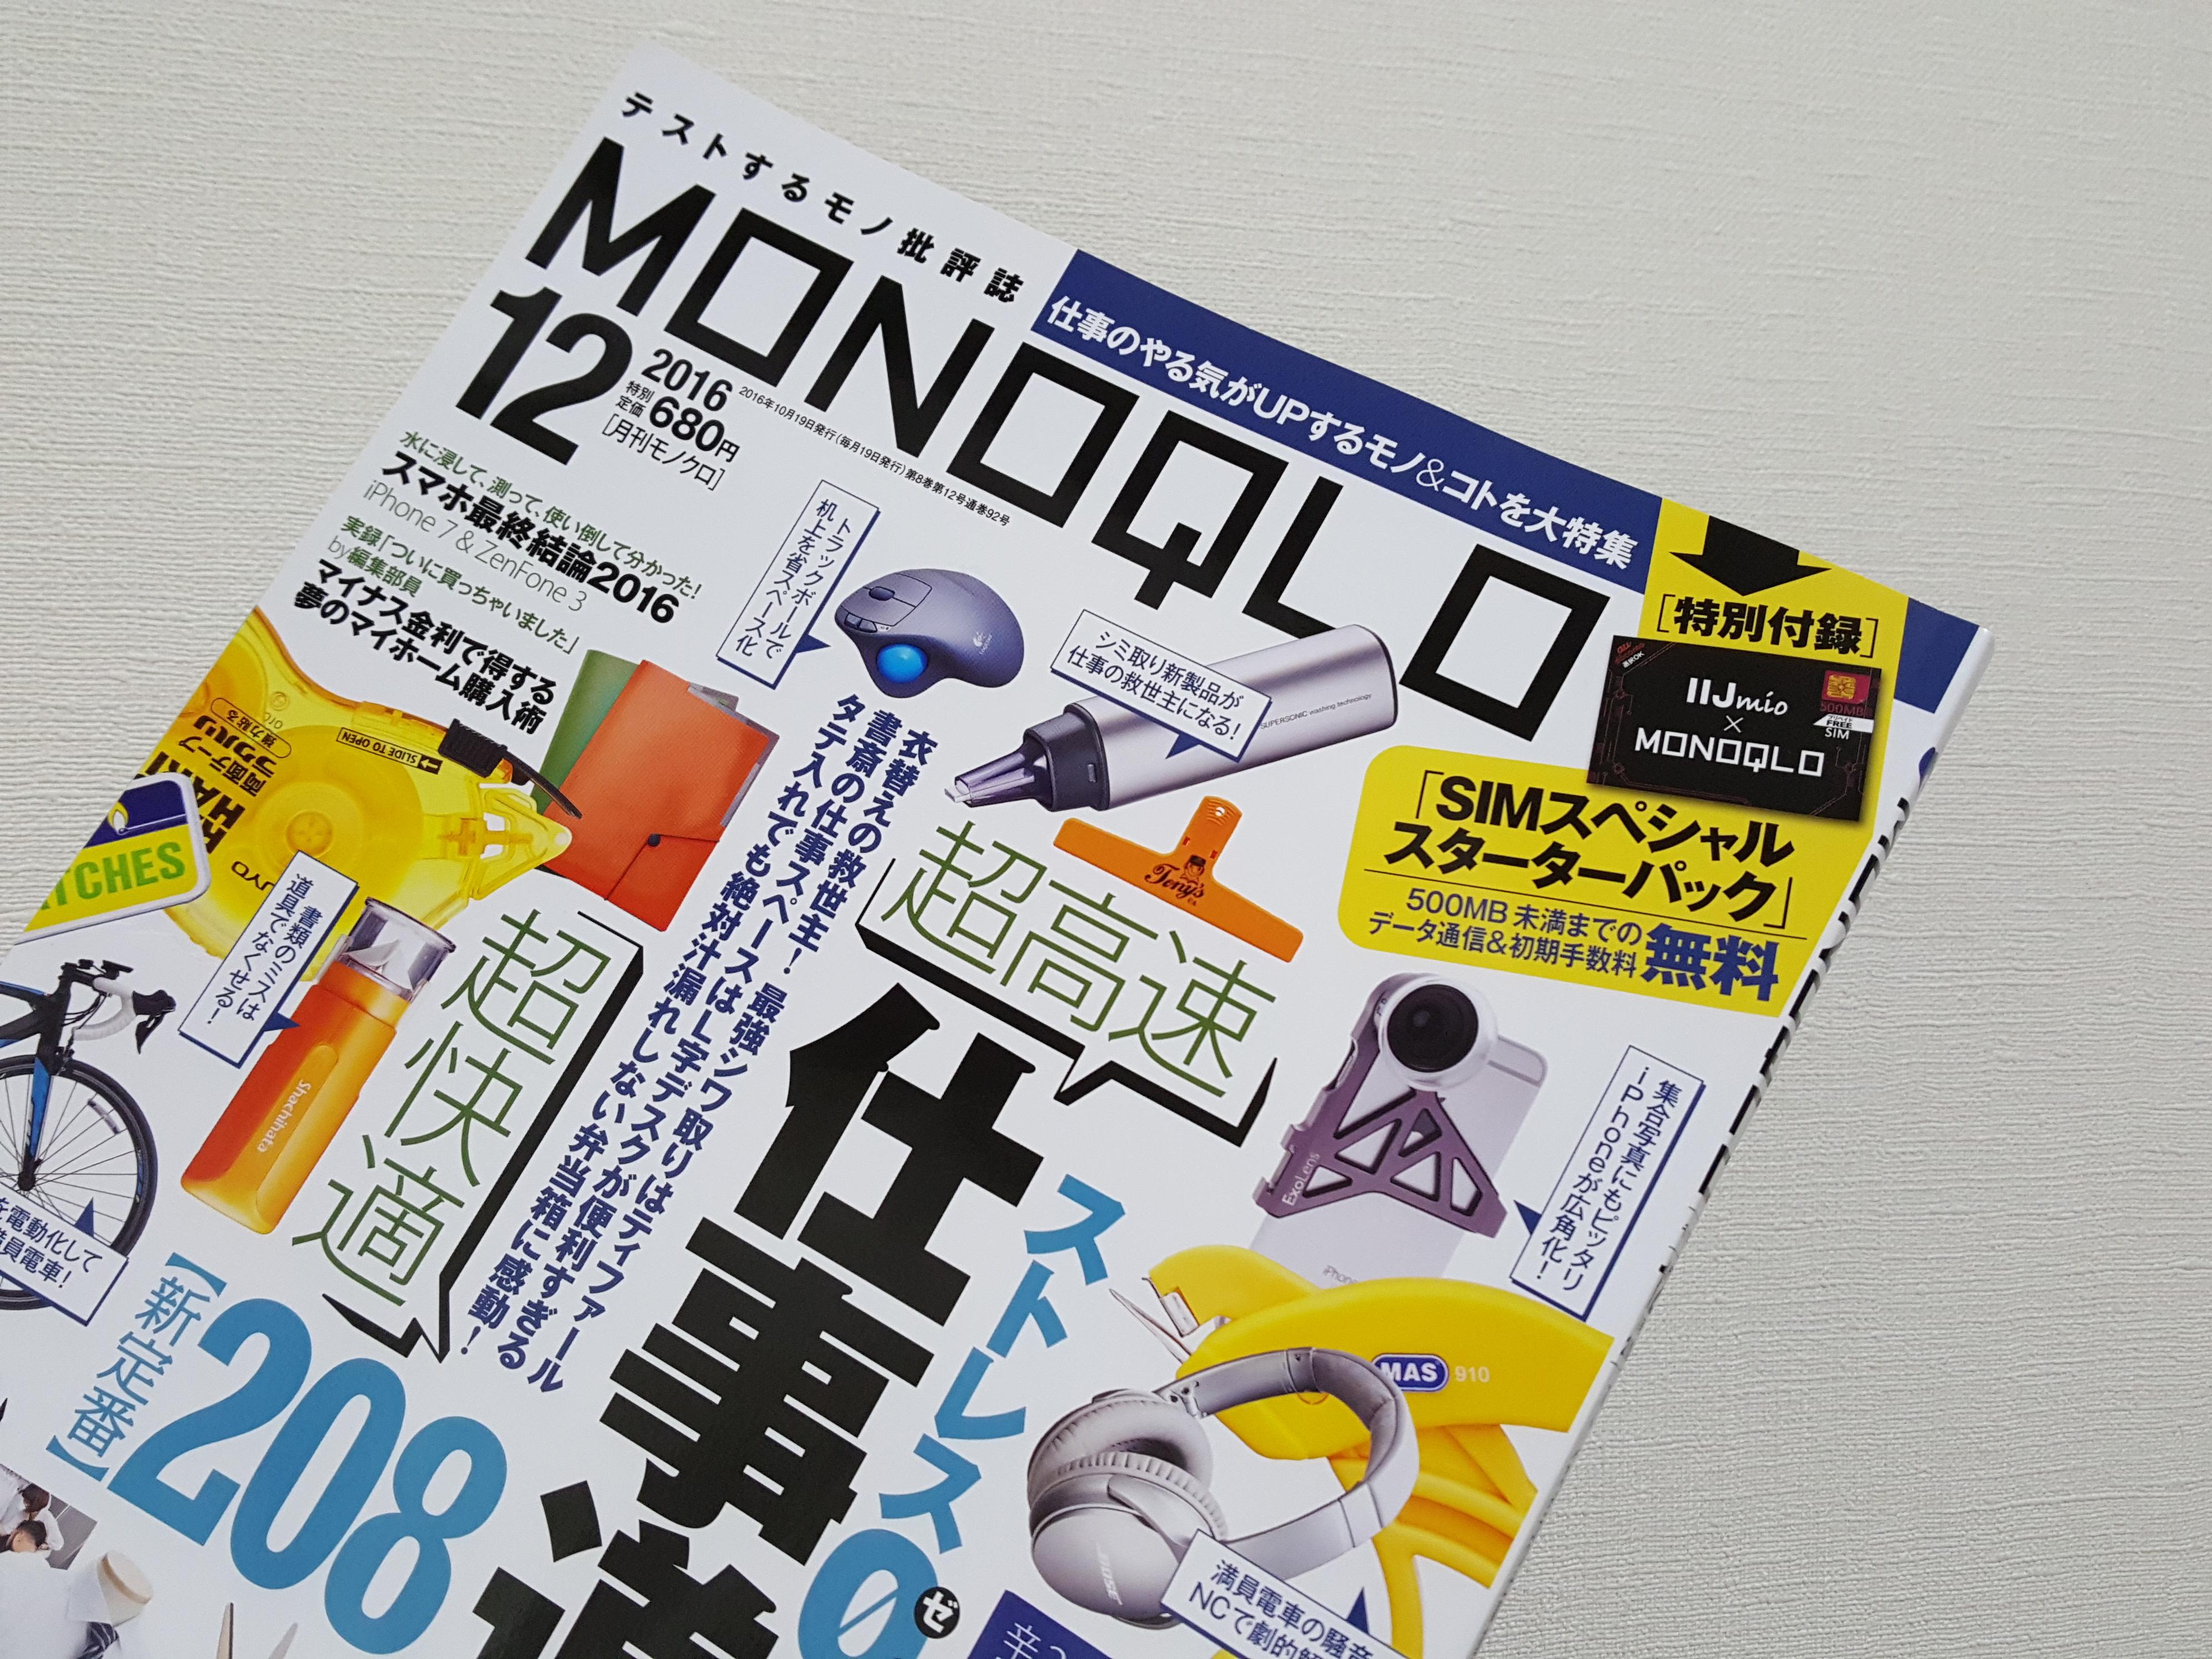 monoqlo_iijmio_201610_9